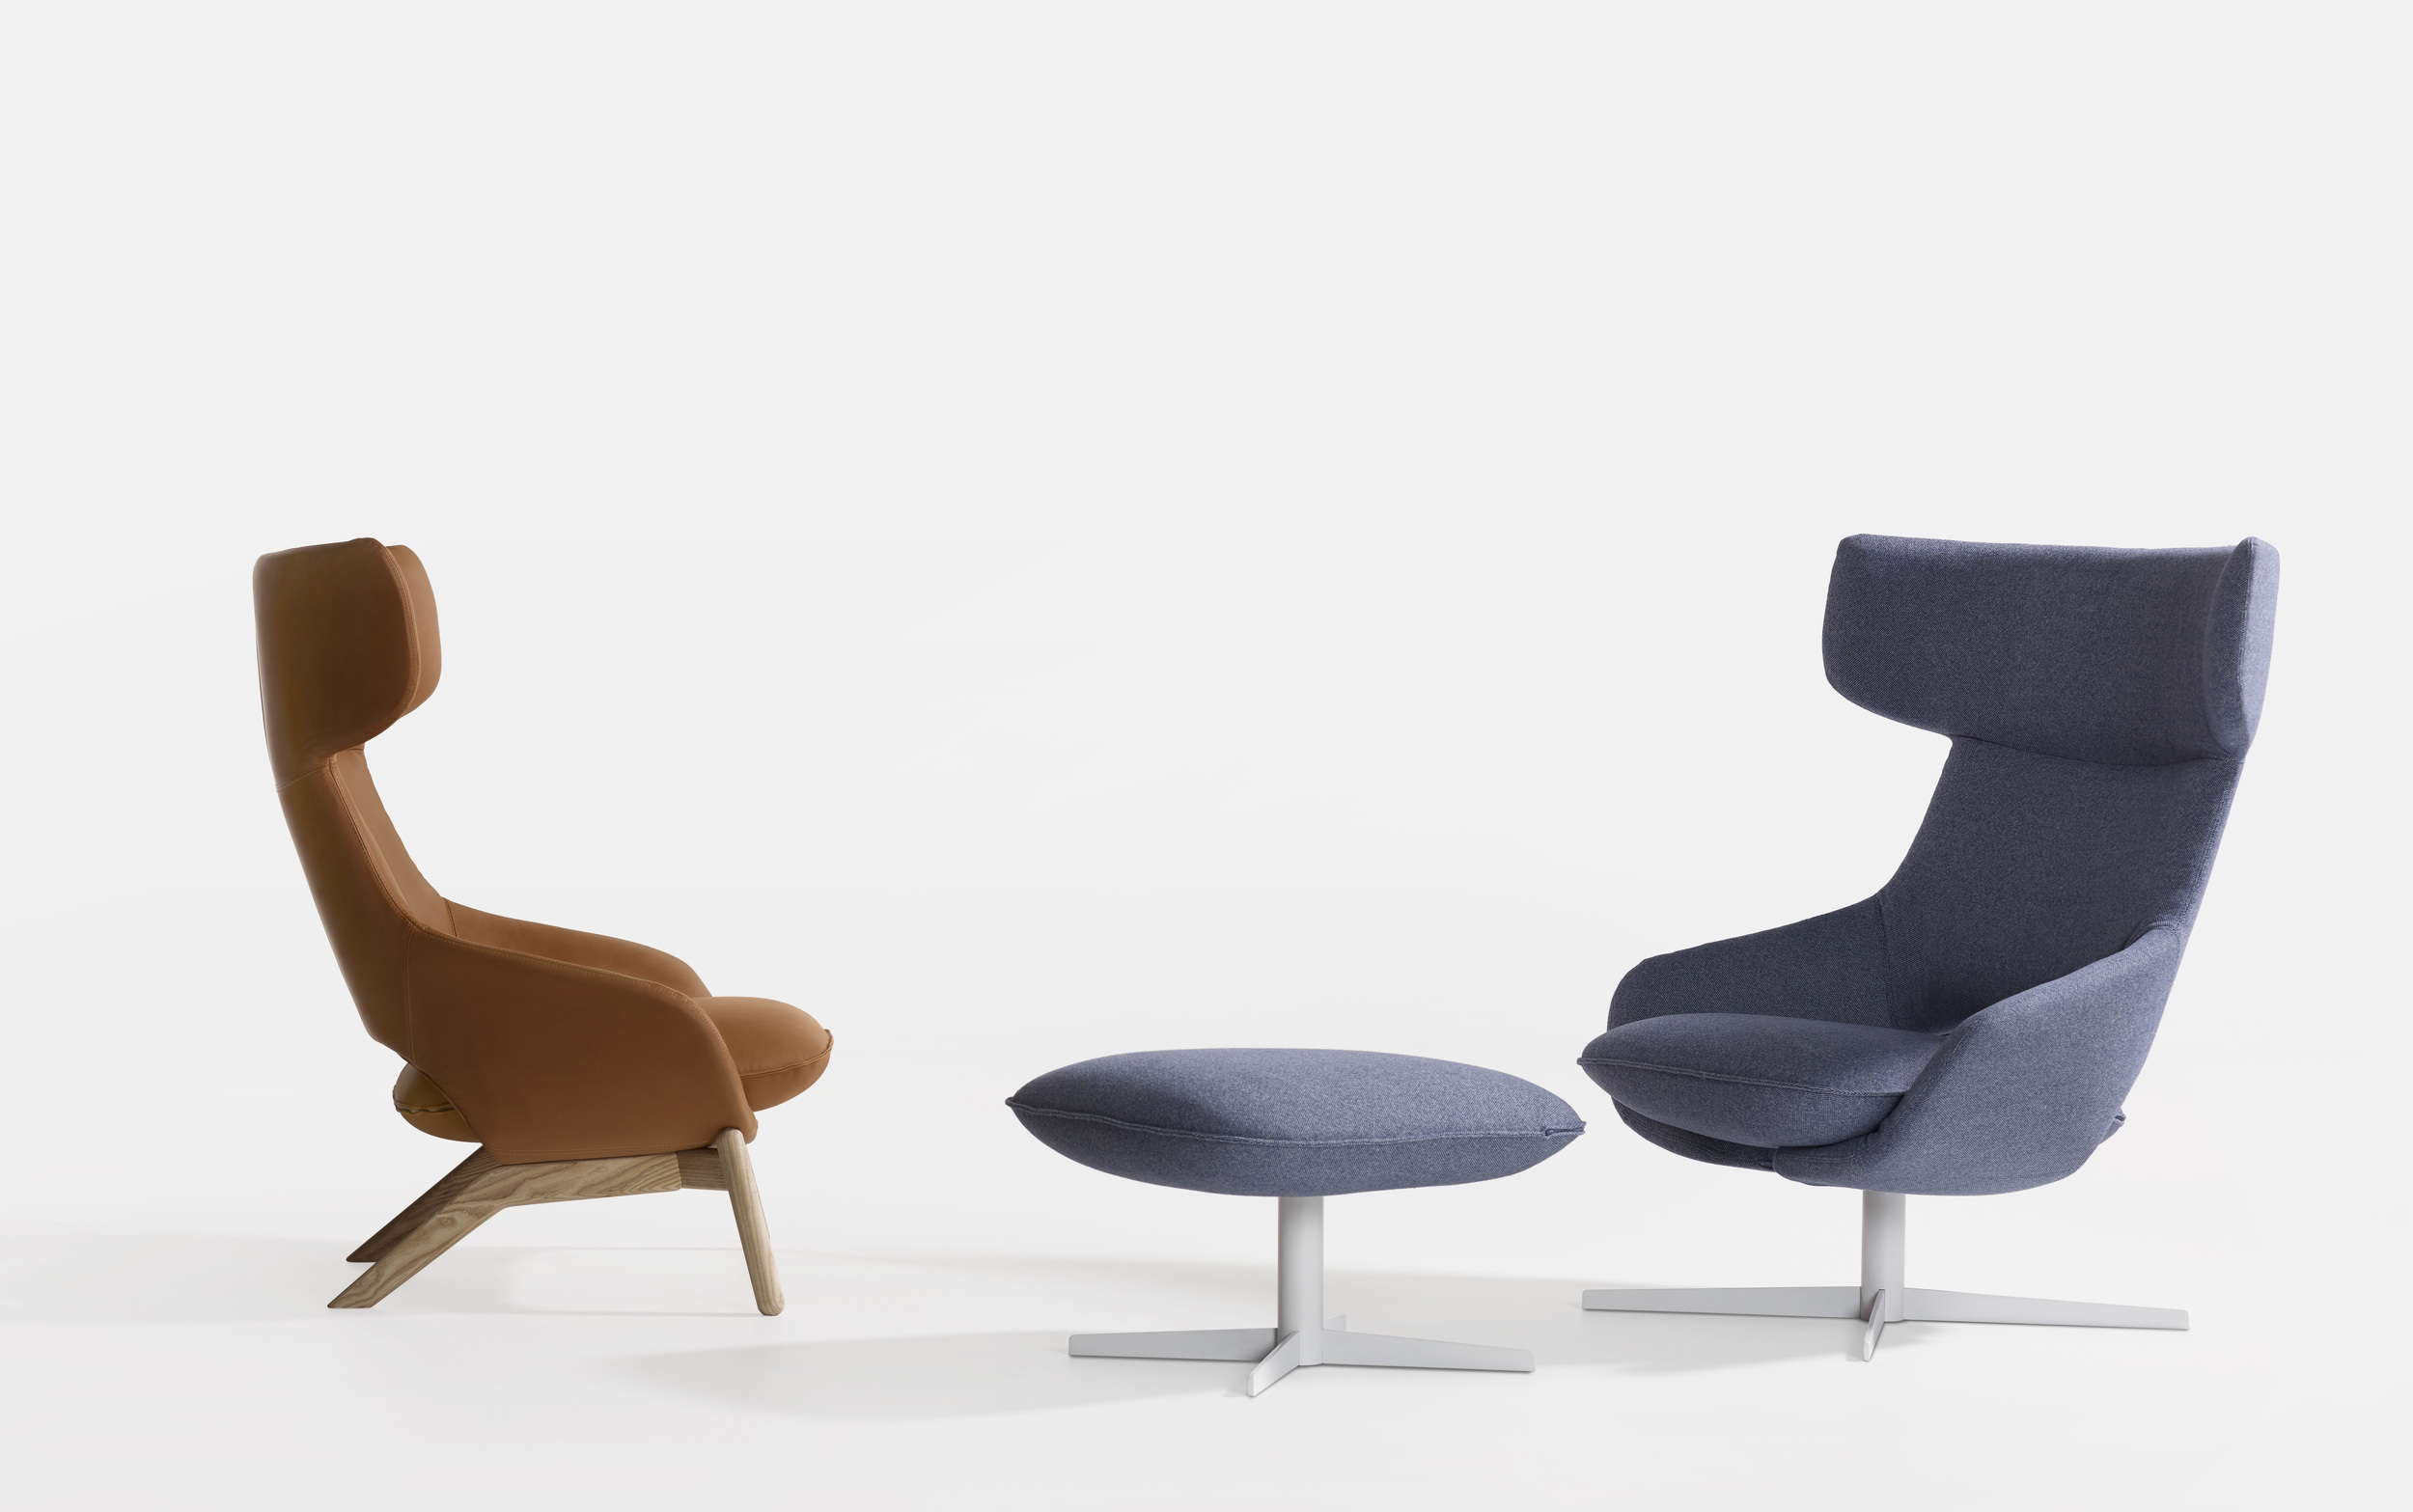 Kalm swivel Lounge chair from Artifort